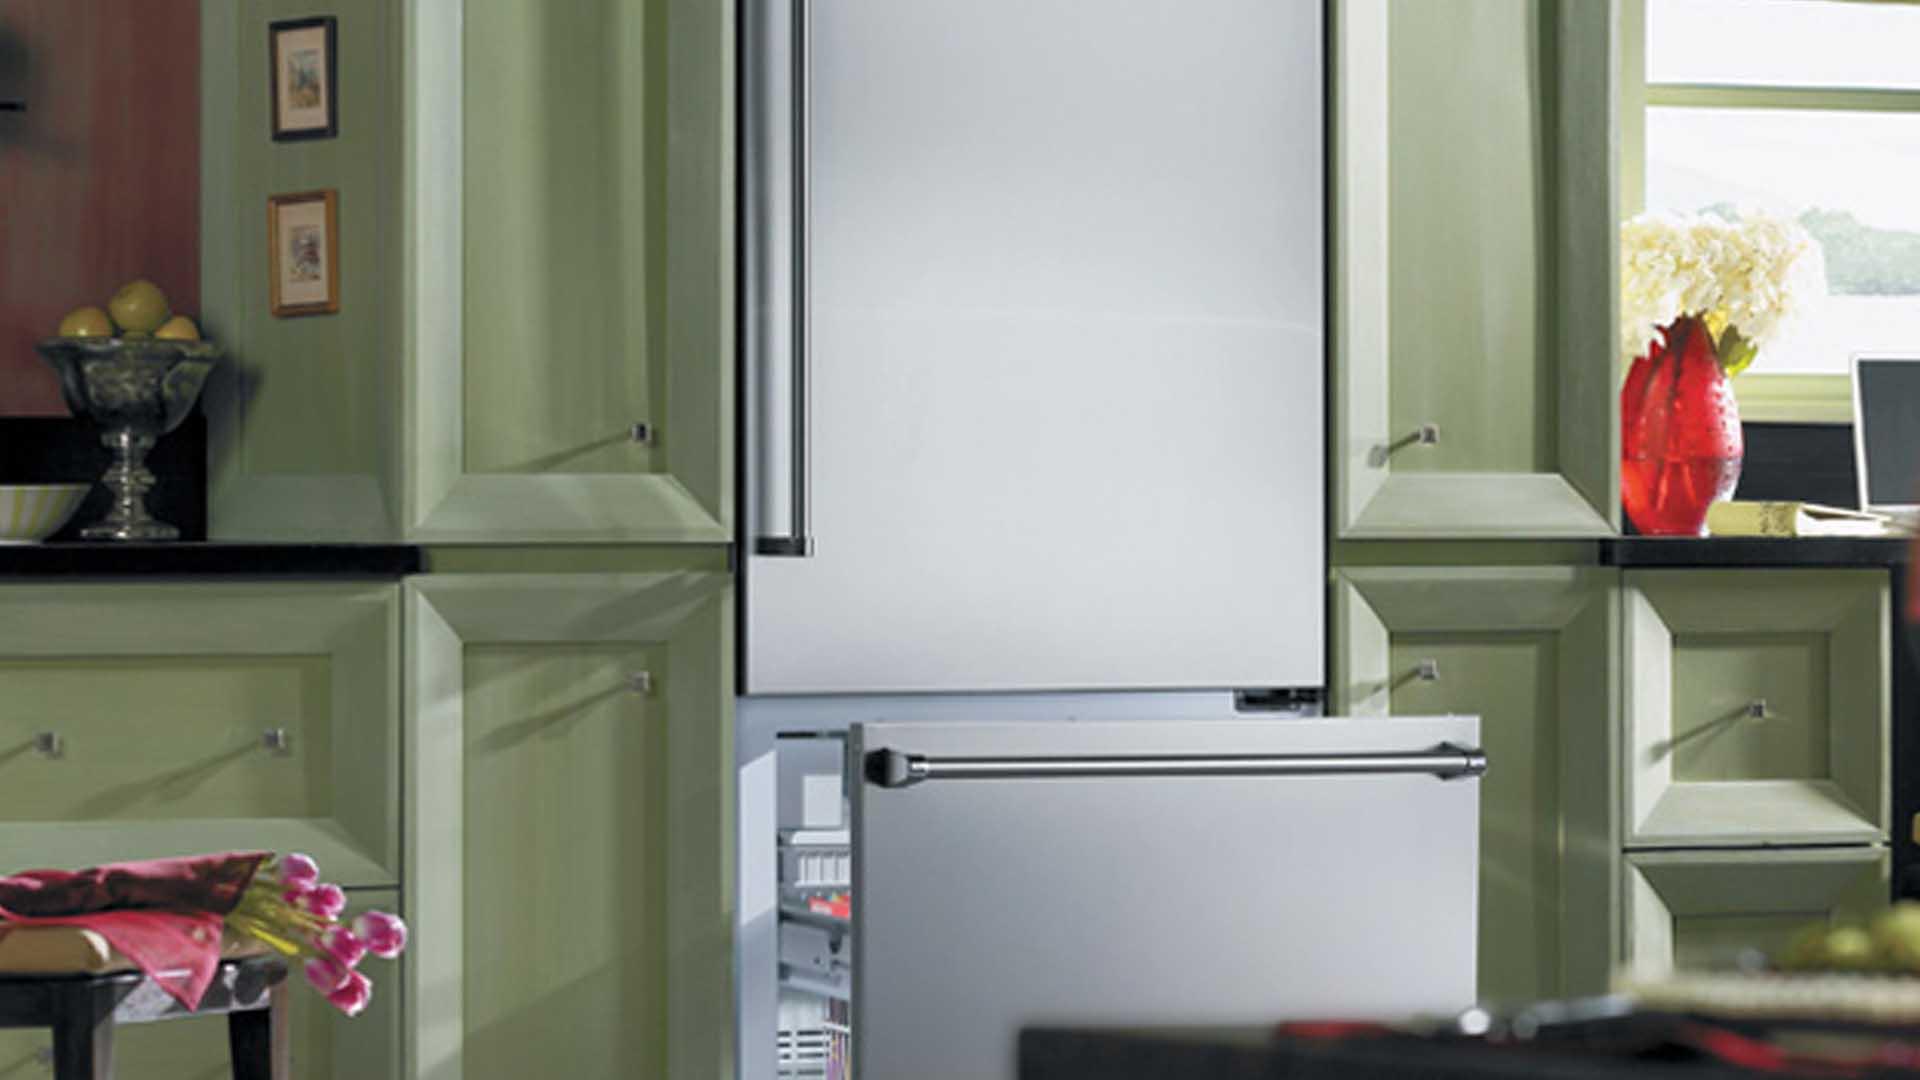 Viking Freestanding Bottom Freezer Refrigerator Repair Service | Viking Appliance Repairs